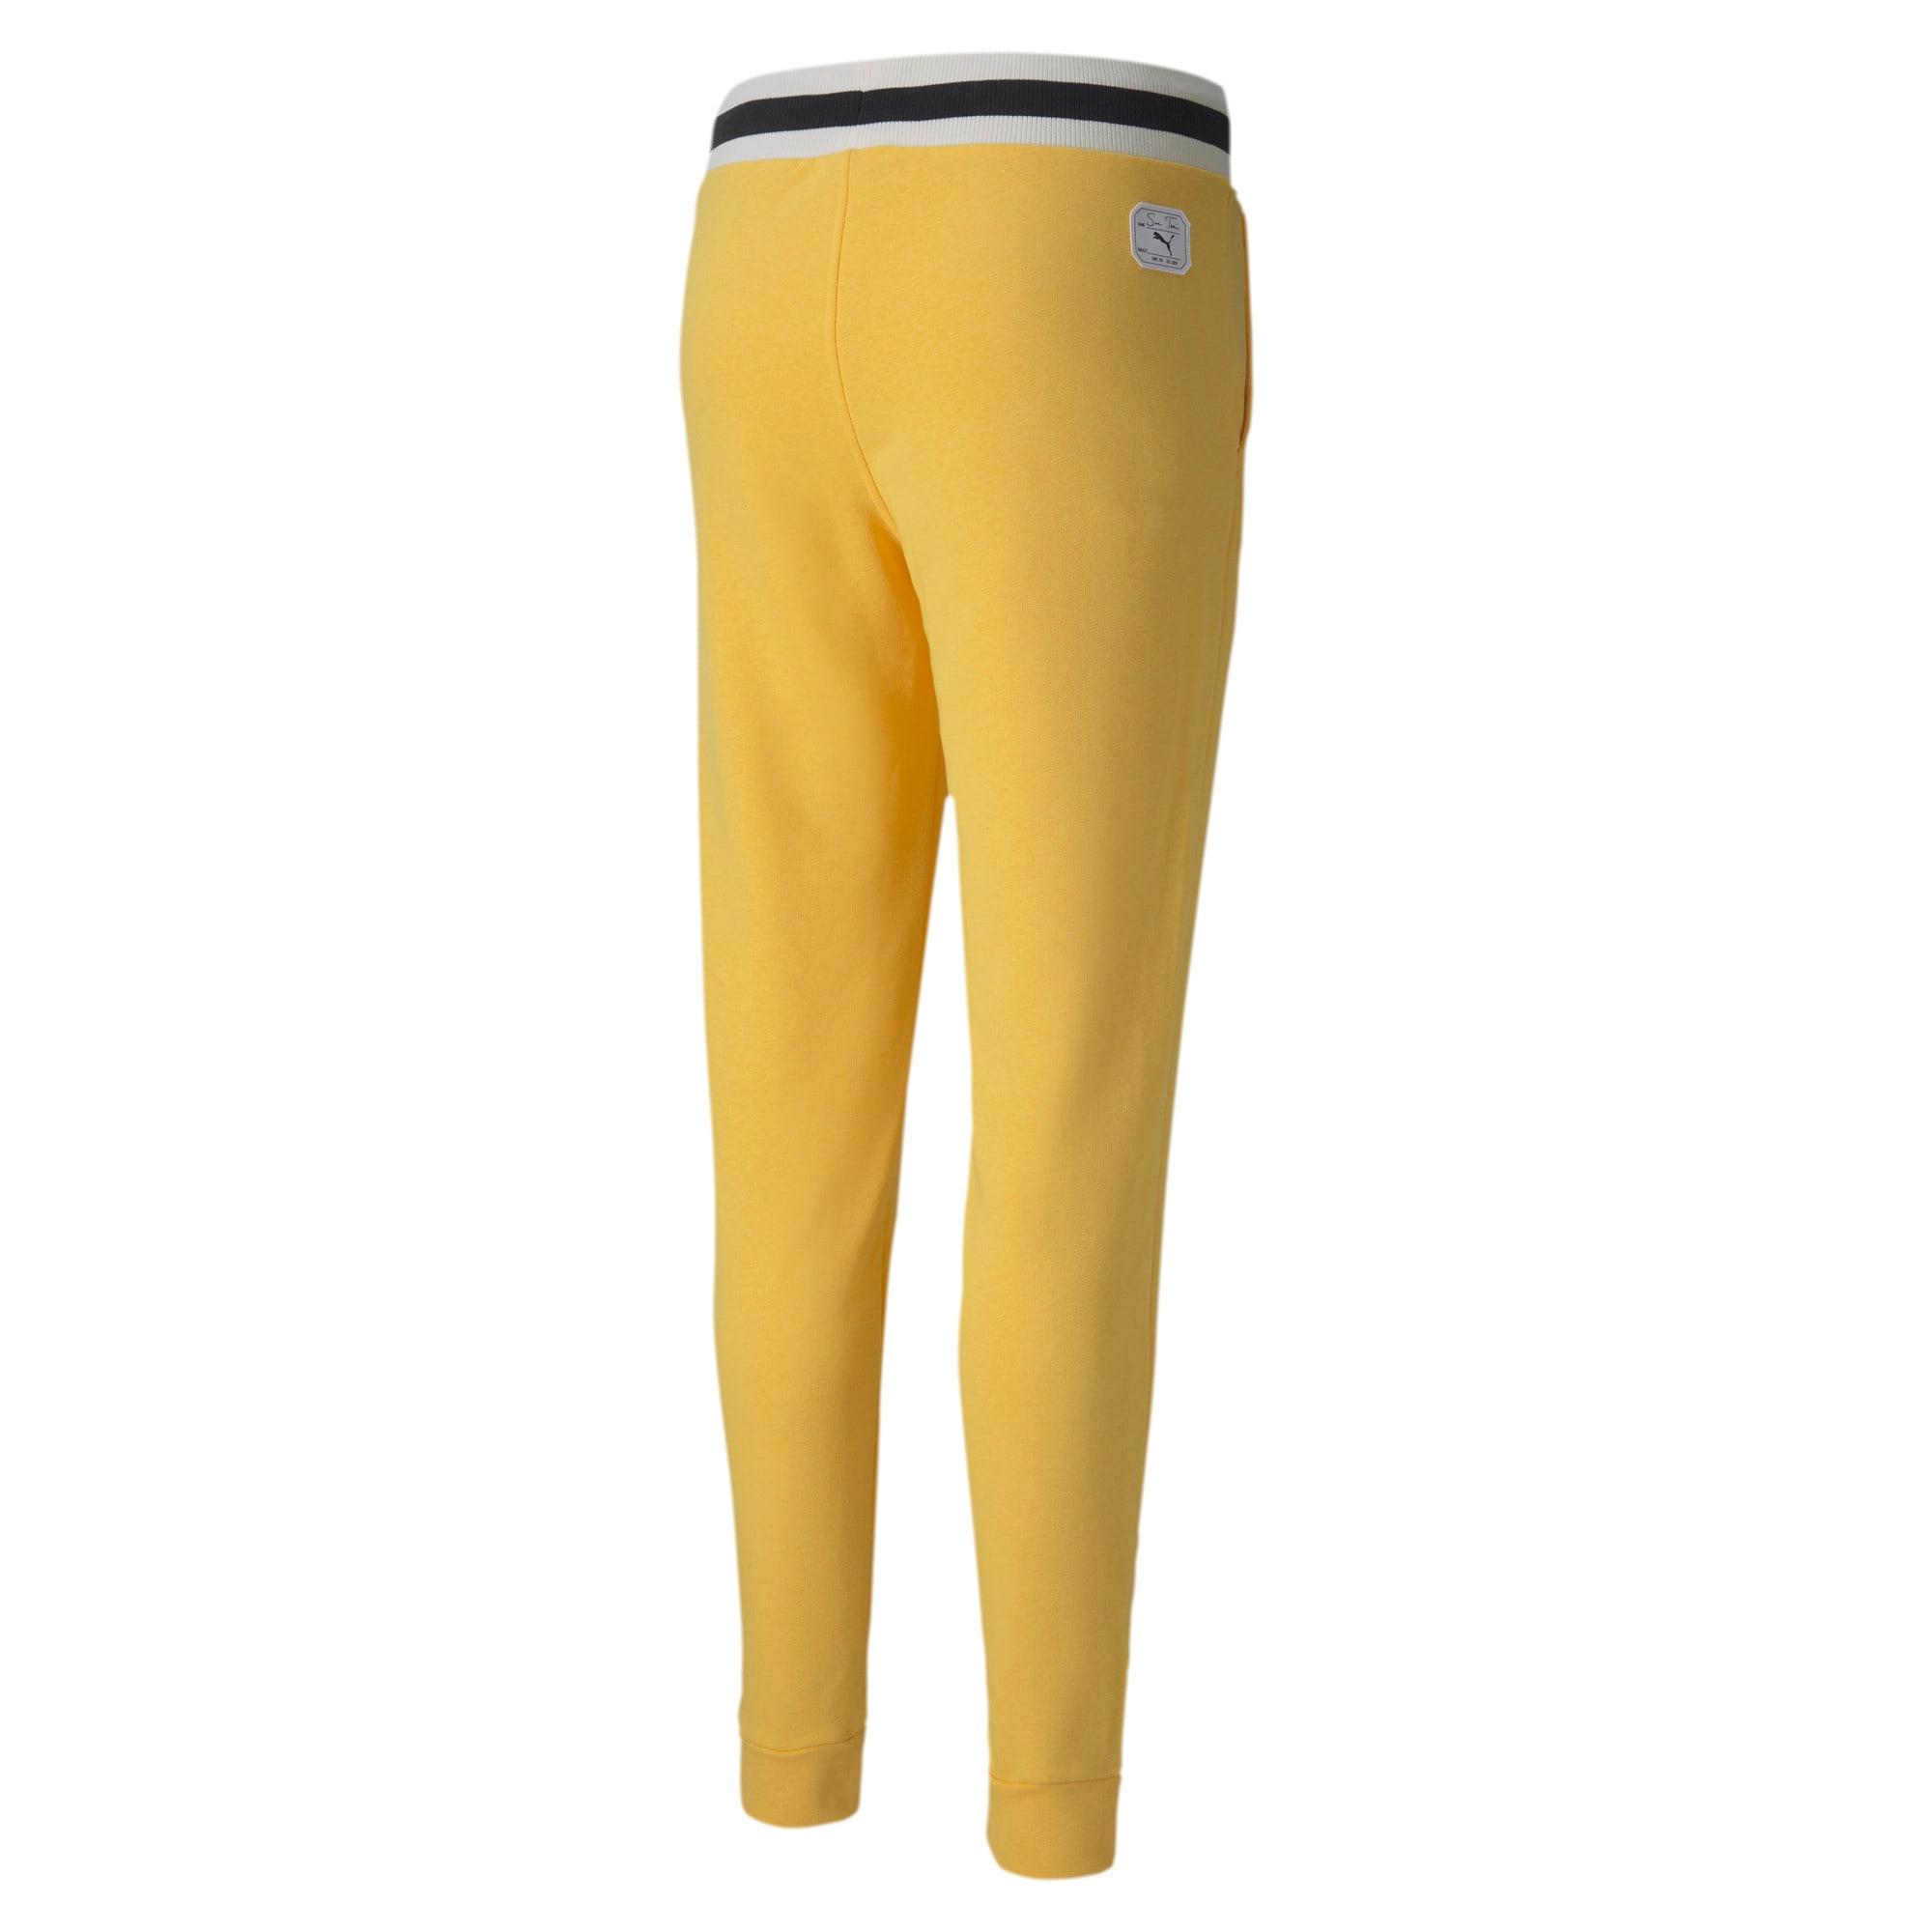 Thumbnail 2 of PUMA x SUE TSAI Women's Sweatpants, Daffodil, medium